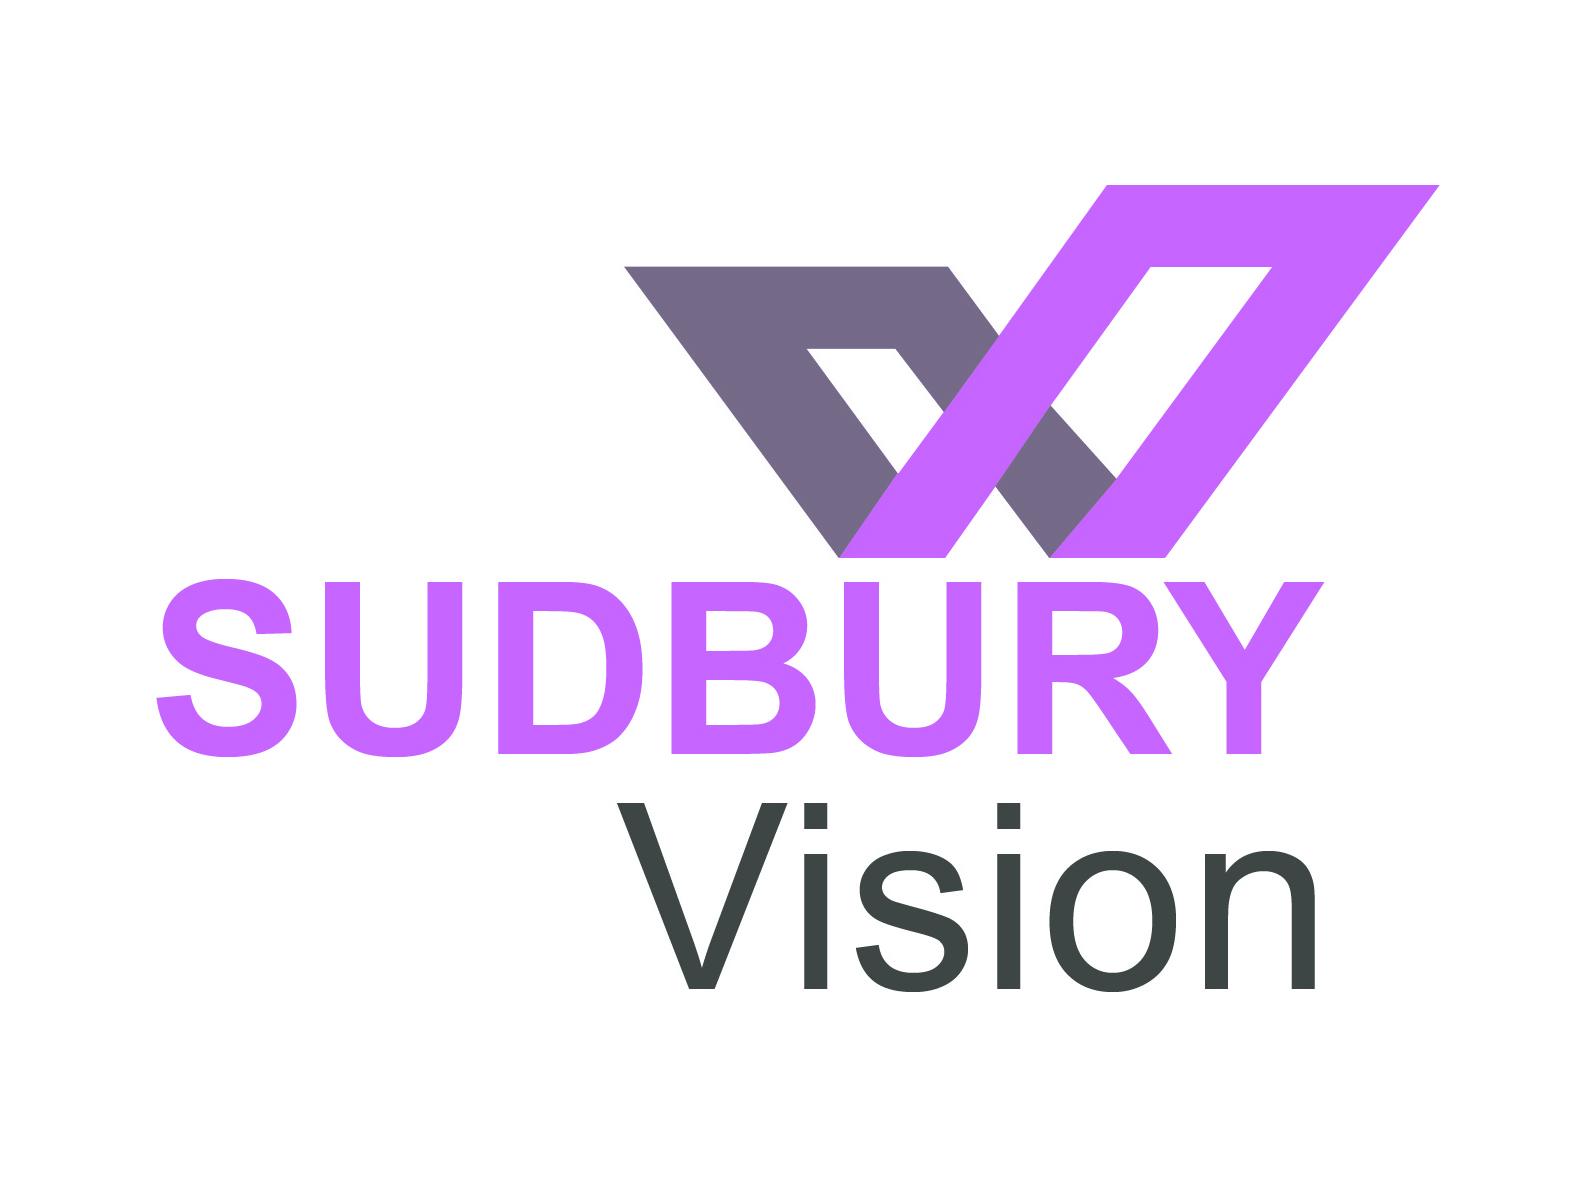 Sudbury Vision